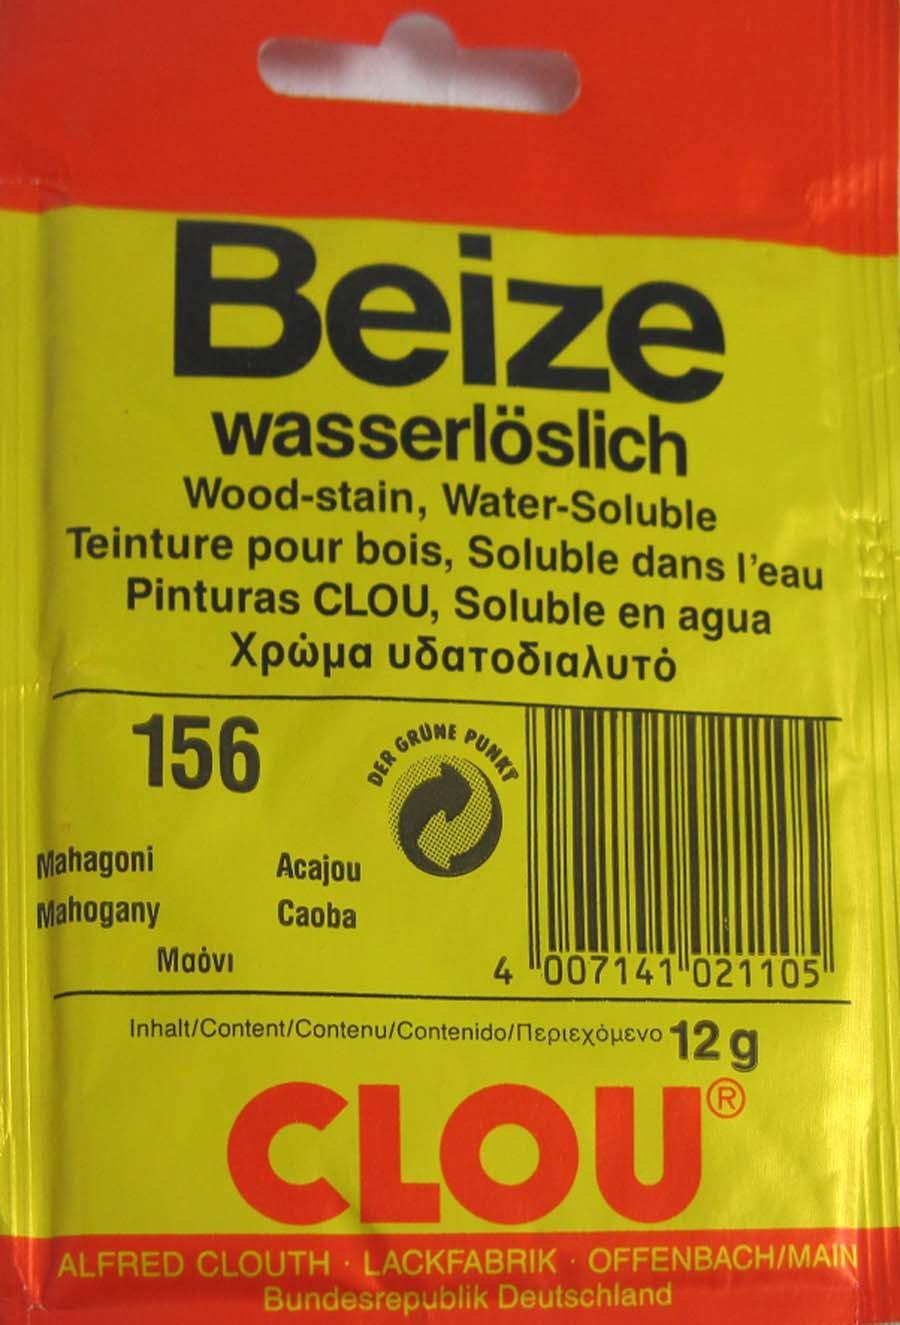 Beize Mahagoni 156 wasserlöslich 12 g Clou